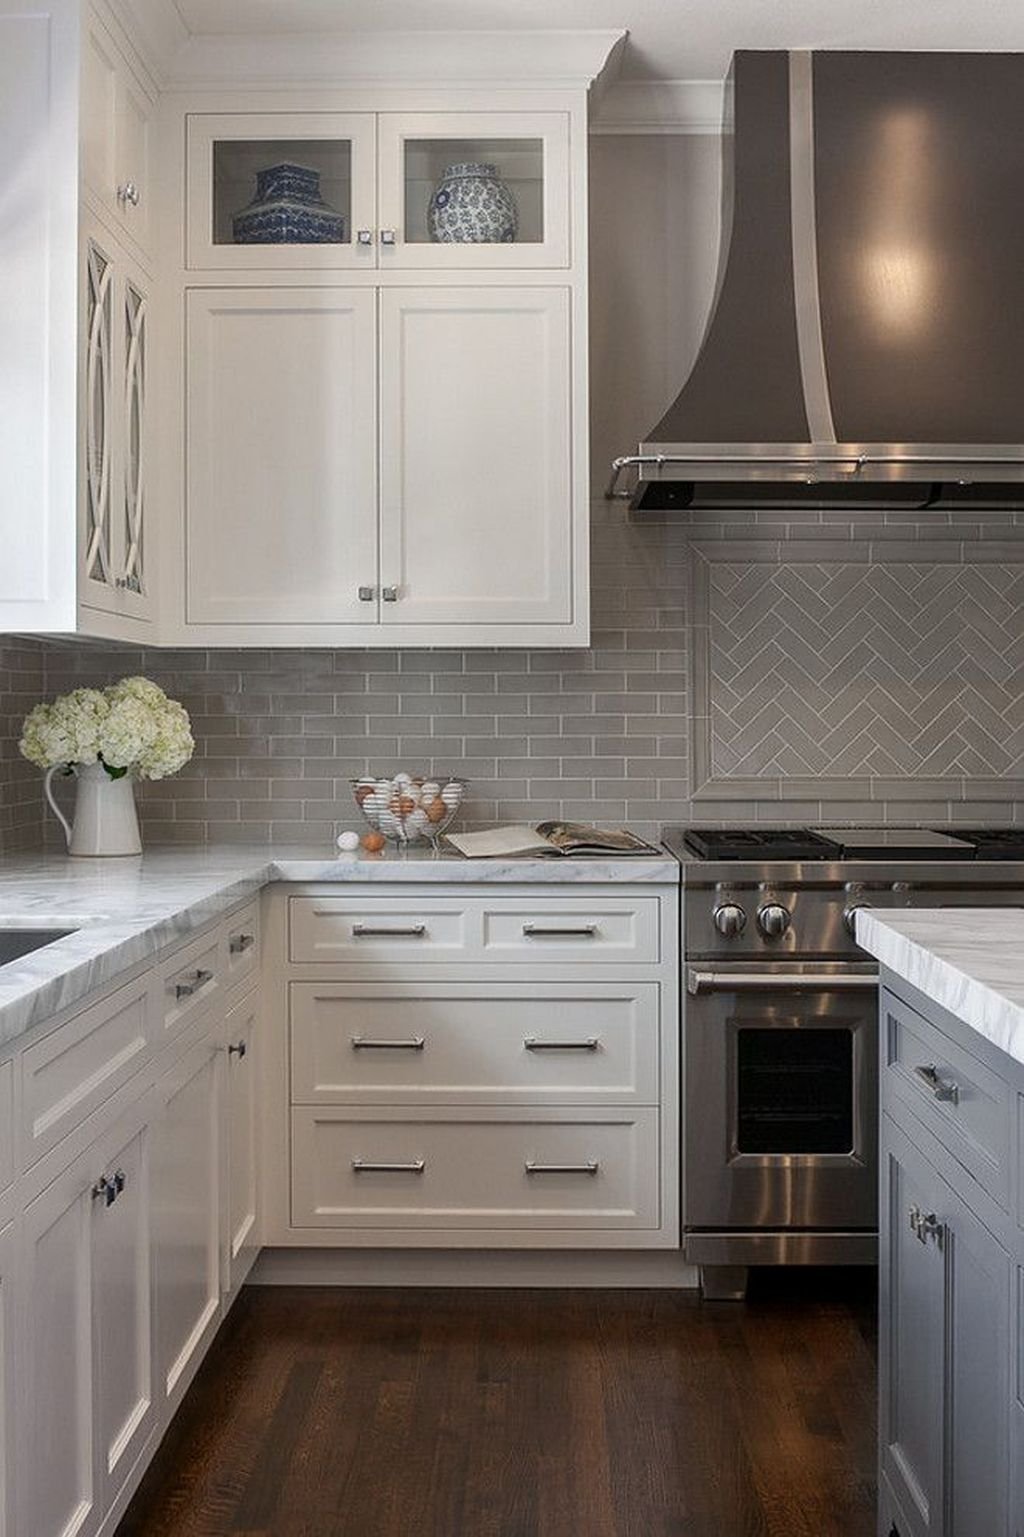 Stunning Glass Backsplash Kitchen Ideas 18